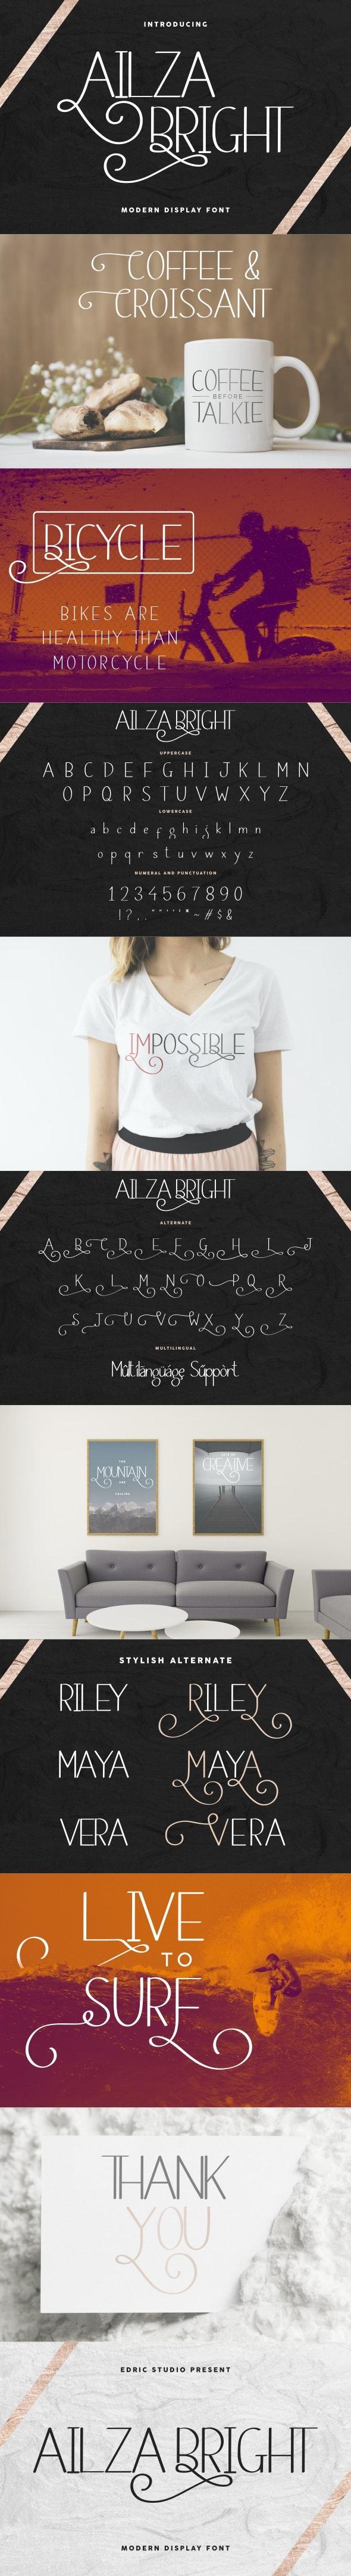 Ailza Bright Display Sans Font - Sans-Serif Fonts